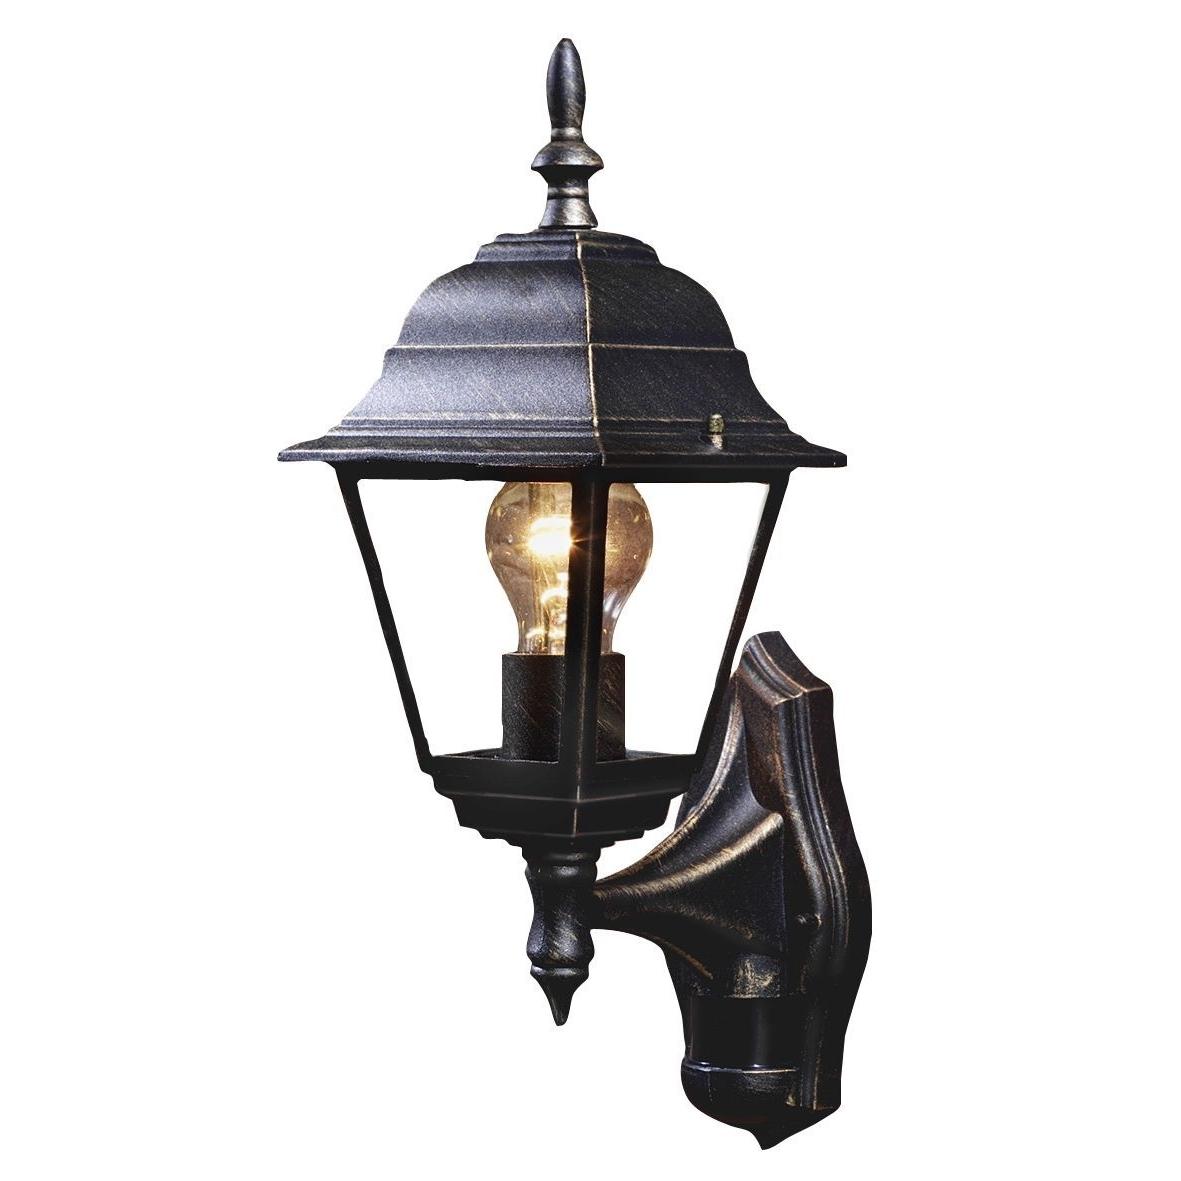 Outdoor Mains Lanterns In Newest B&q Polperro Antique Effect Black 60w Mains Powered External Pir (View 7 of 20)